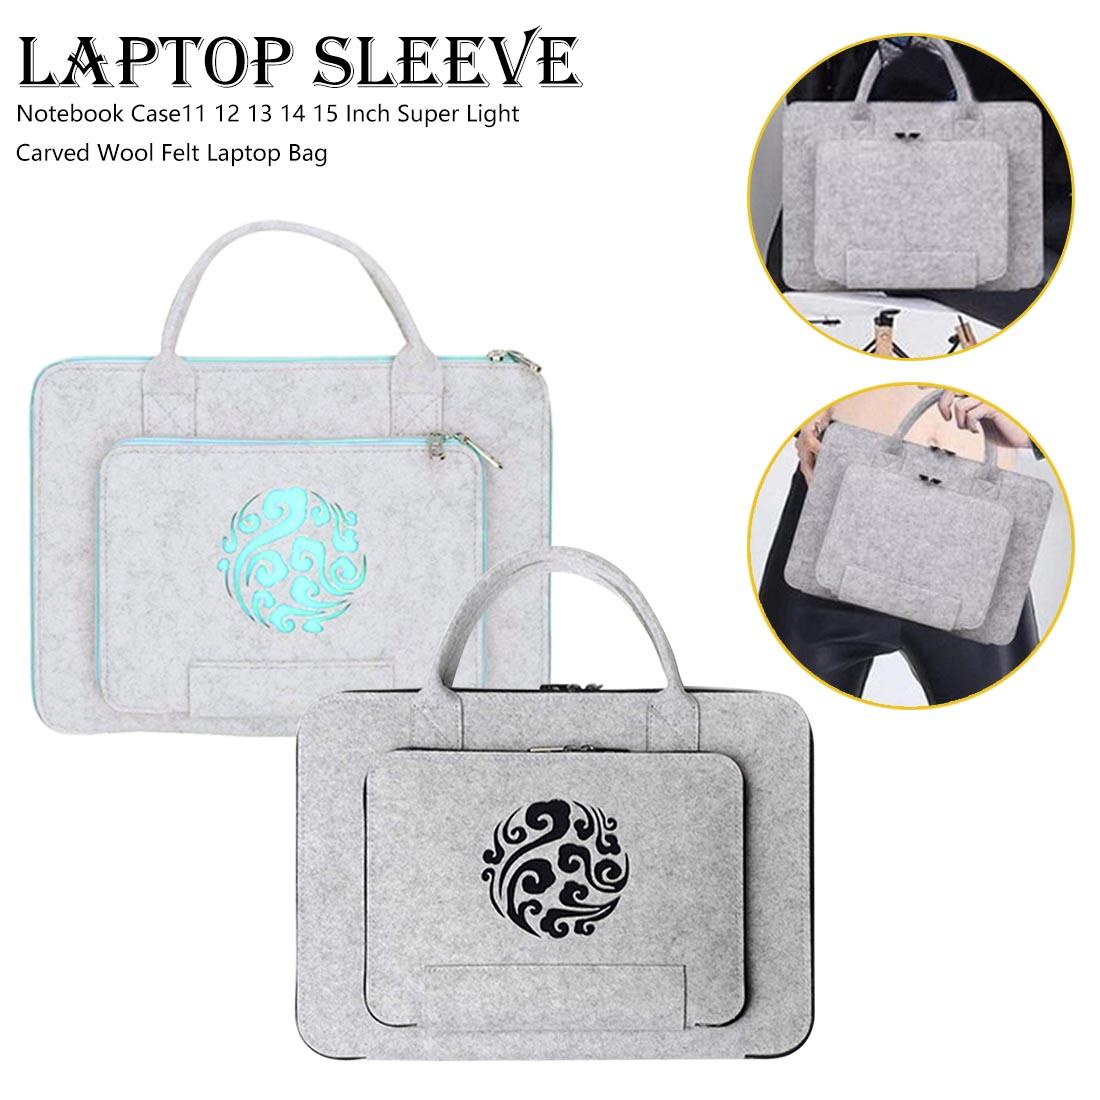 Super Light Wool Felt Laptop Bag 11 12 13 14 15Inch  For Macbook Lenovo Dell Hp Asus Computer Bag Notebook Case